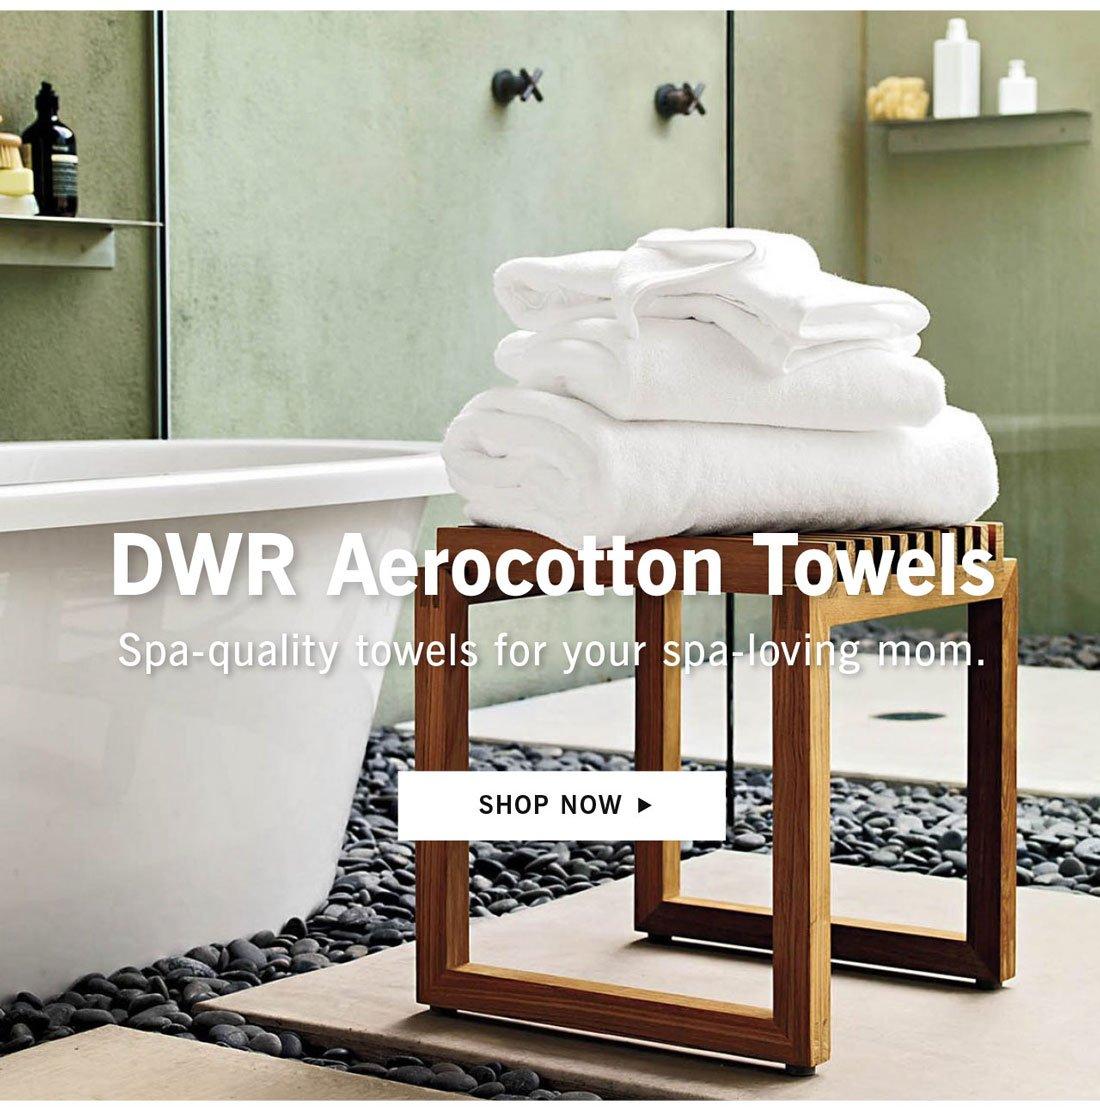 Aerocotton Towels